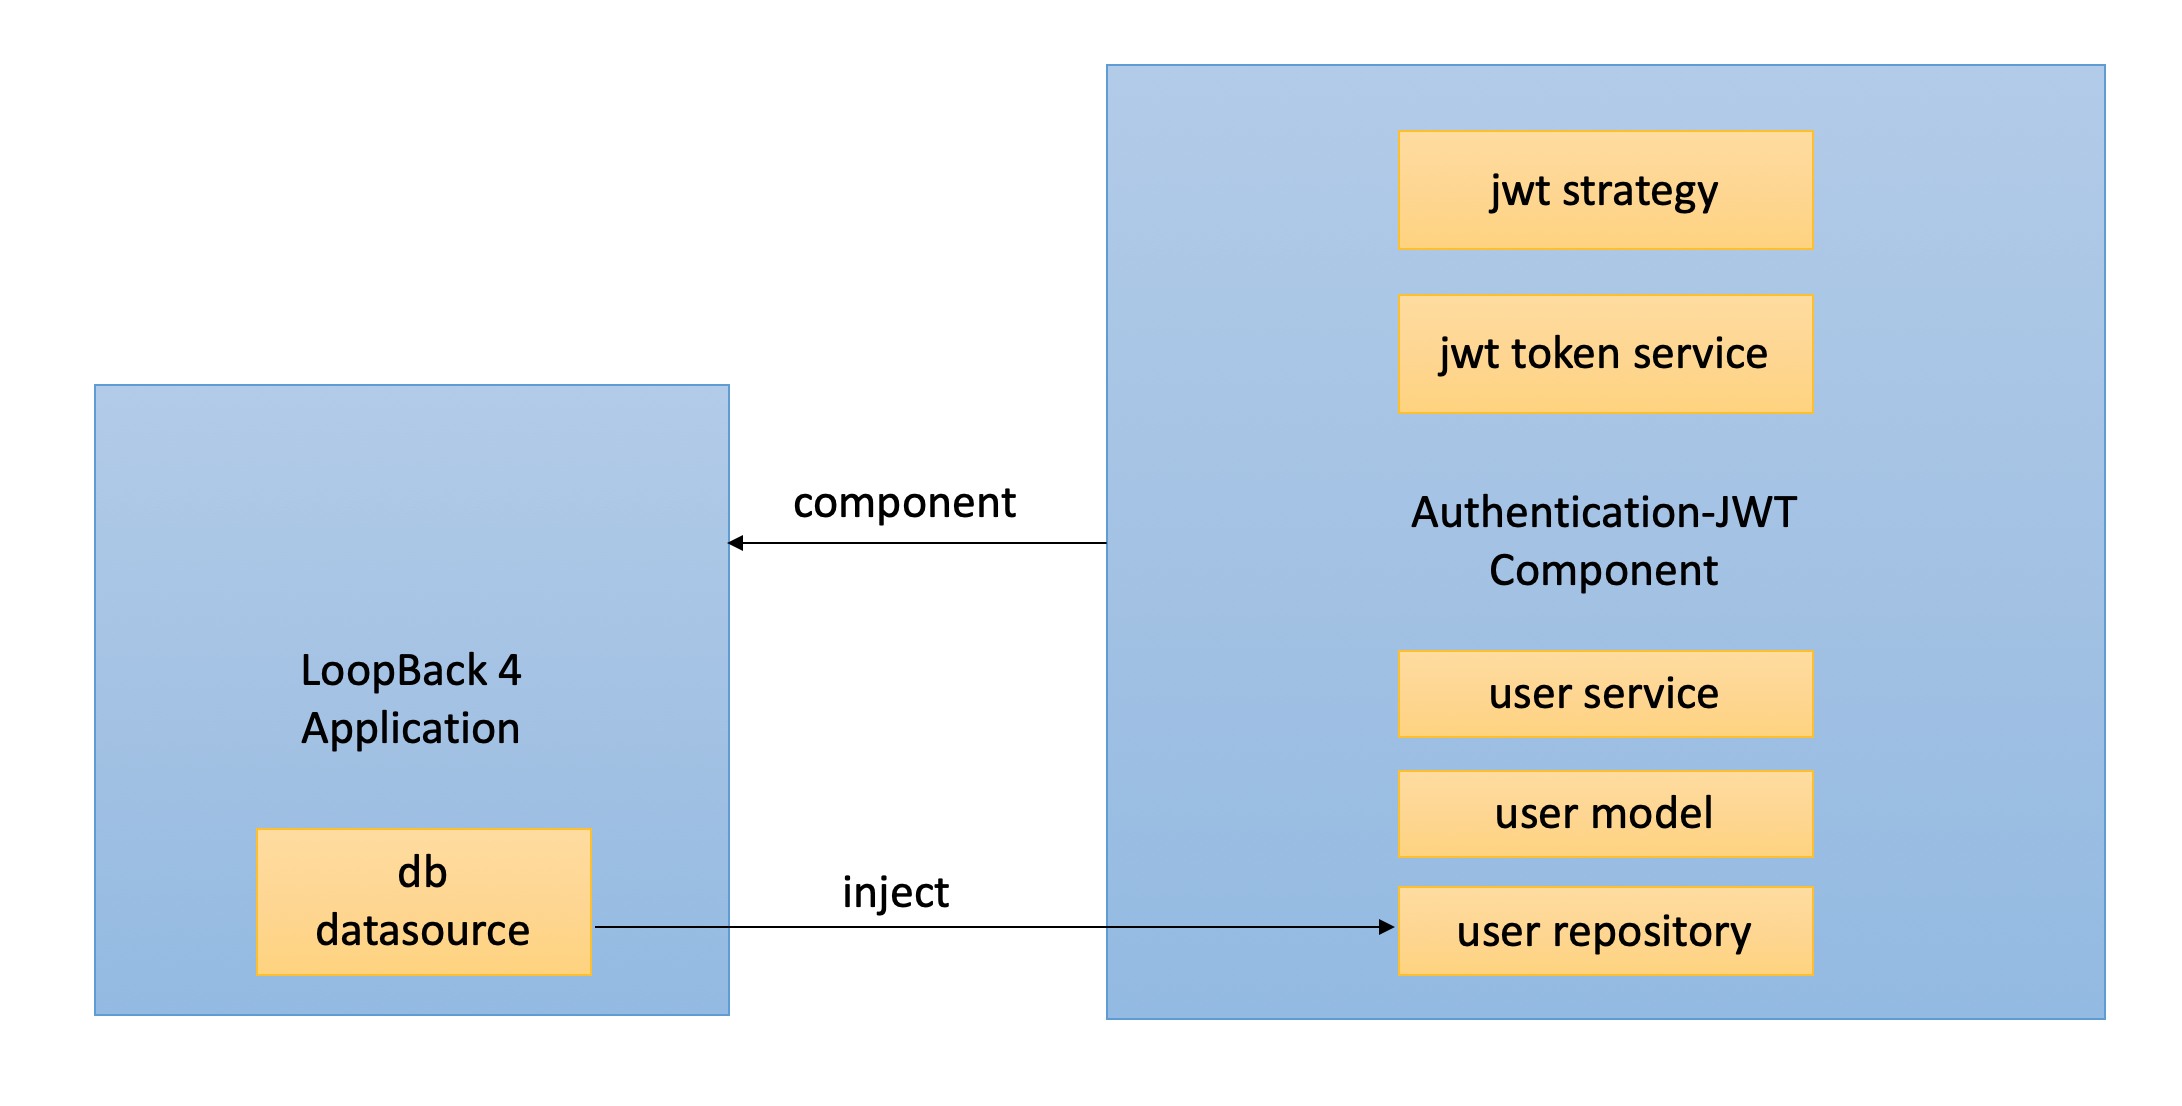 authentication-jwt